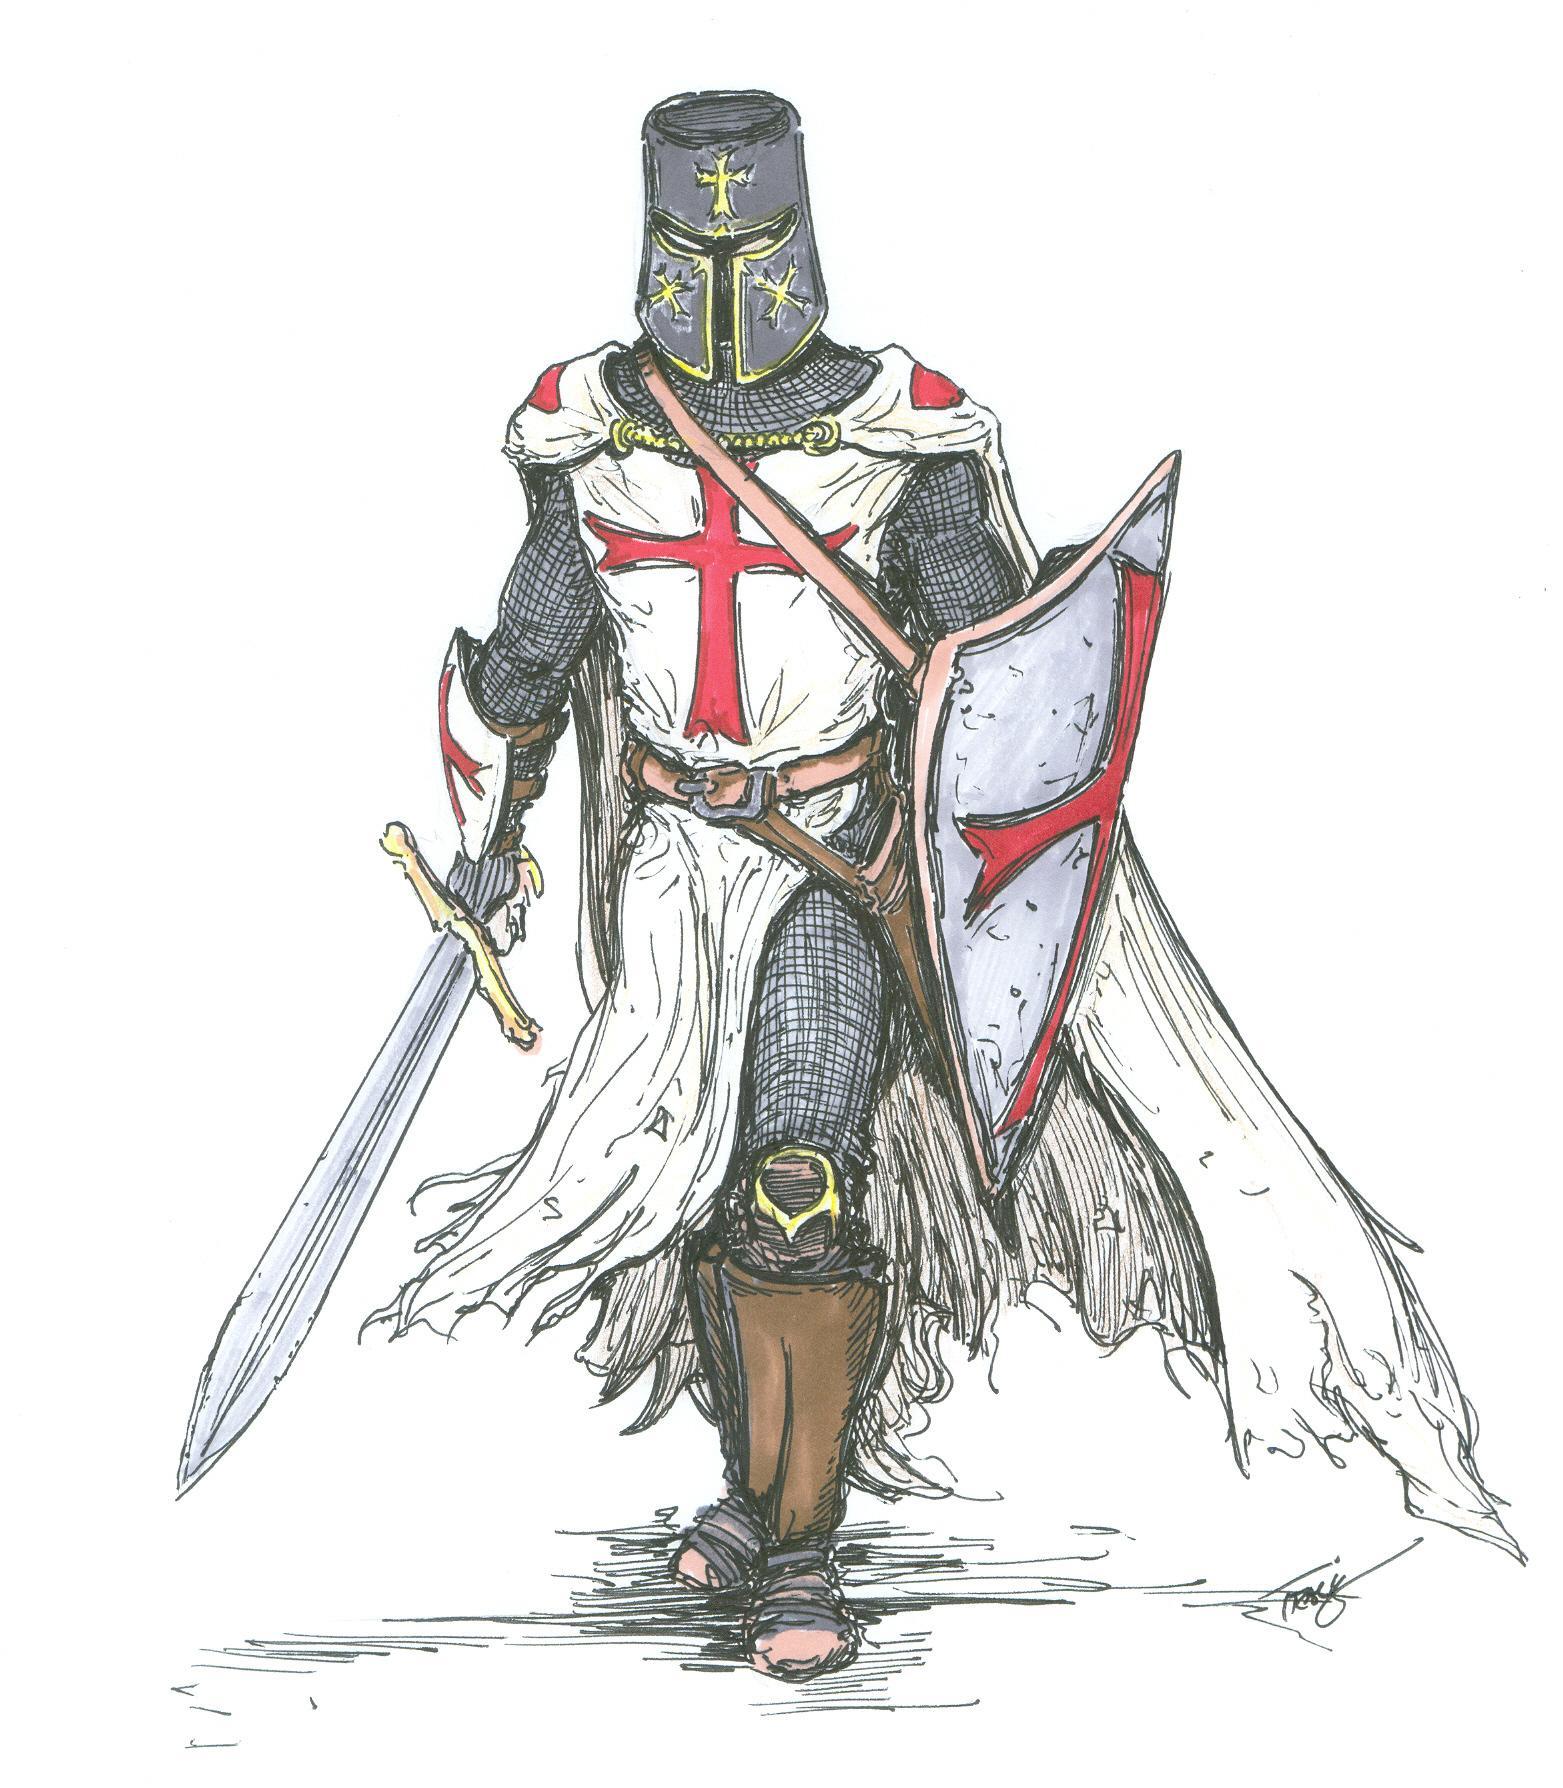 1563x1788px 314.94 KB Knights Templar #404318.